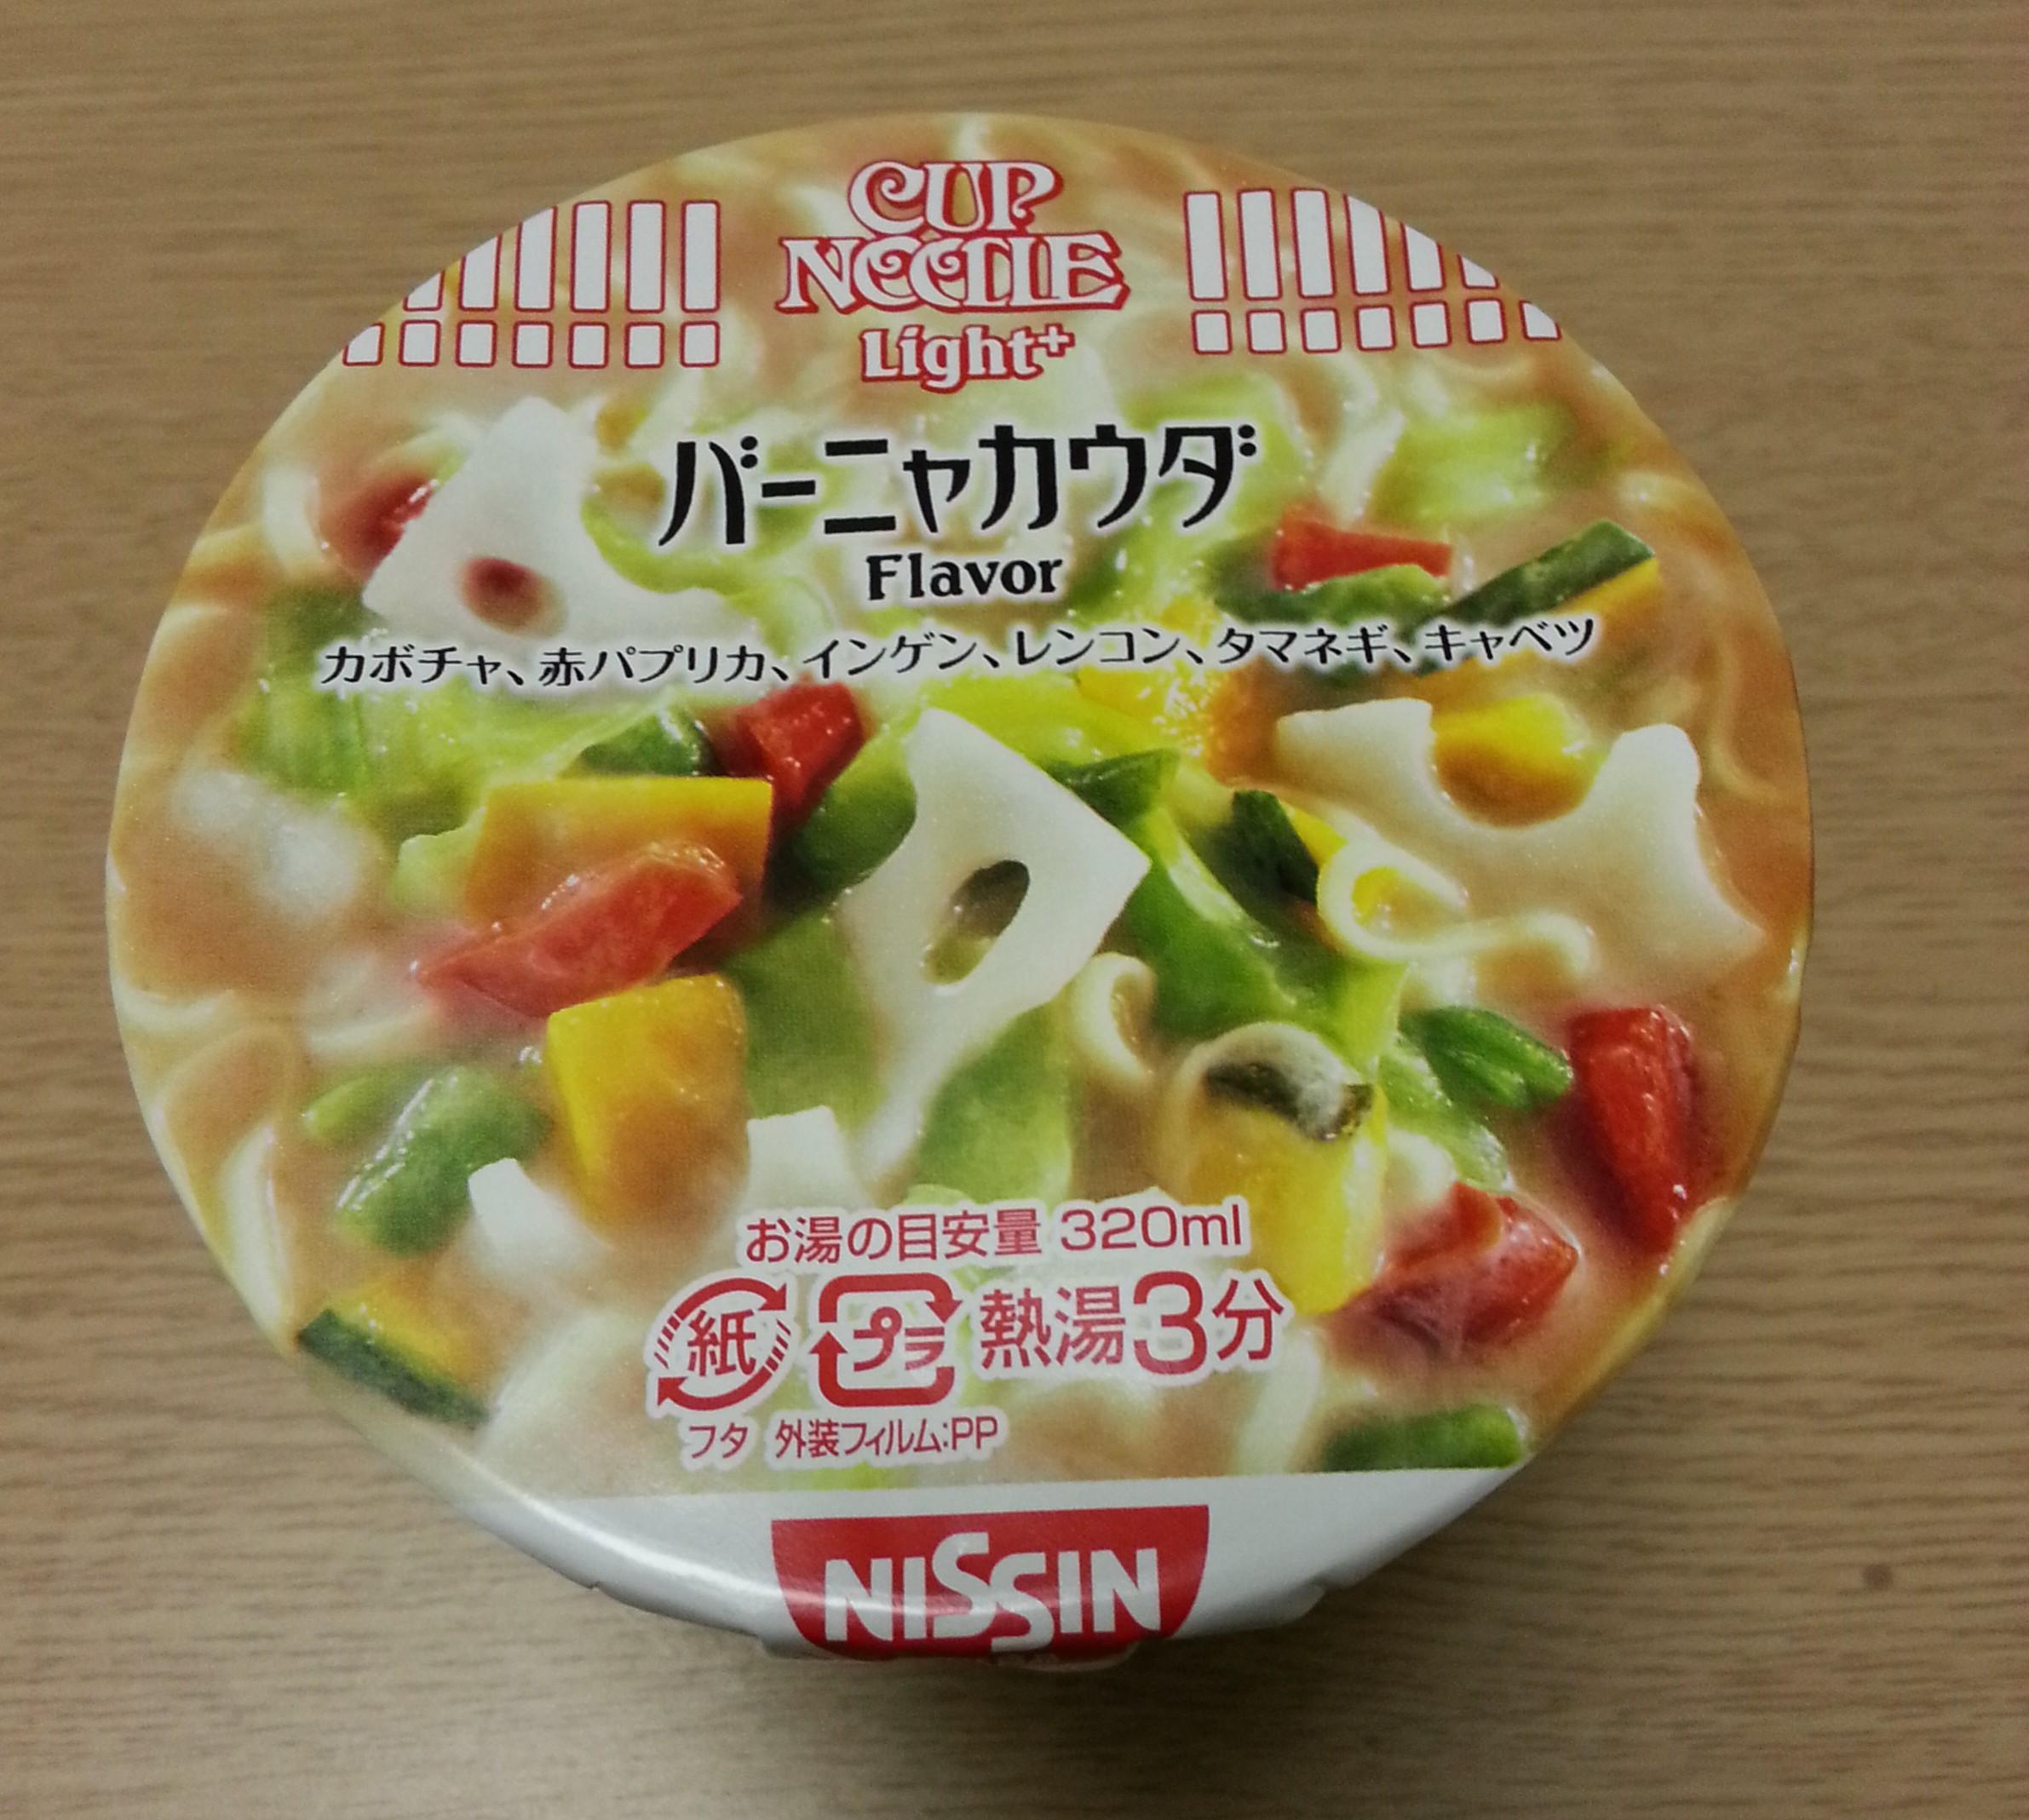 nissin-cupnoodle-bagnacauda2